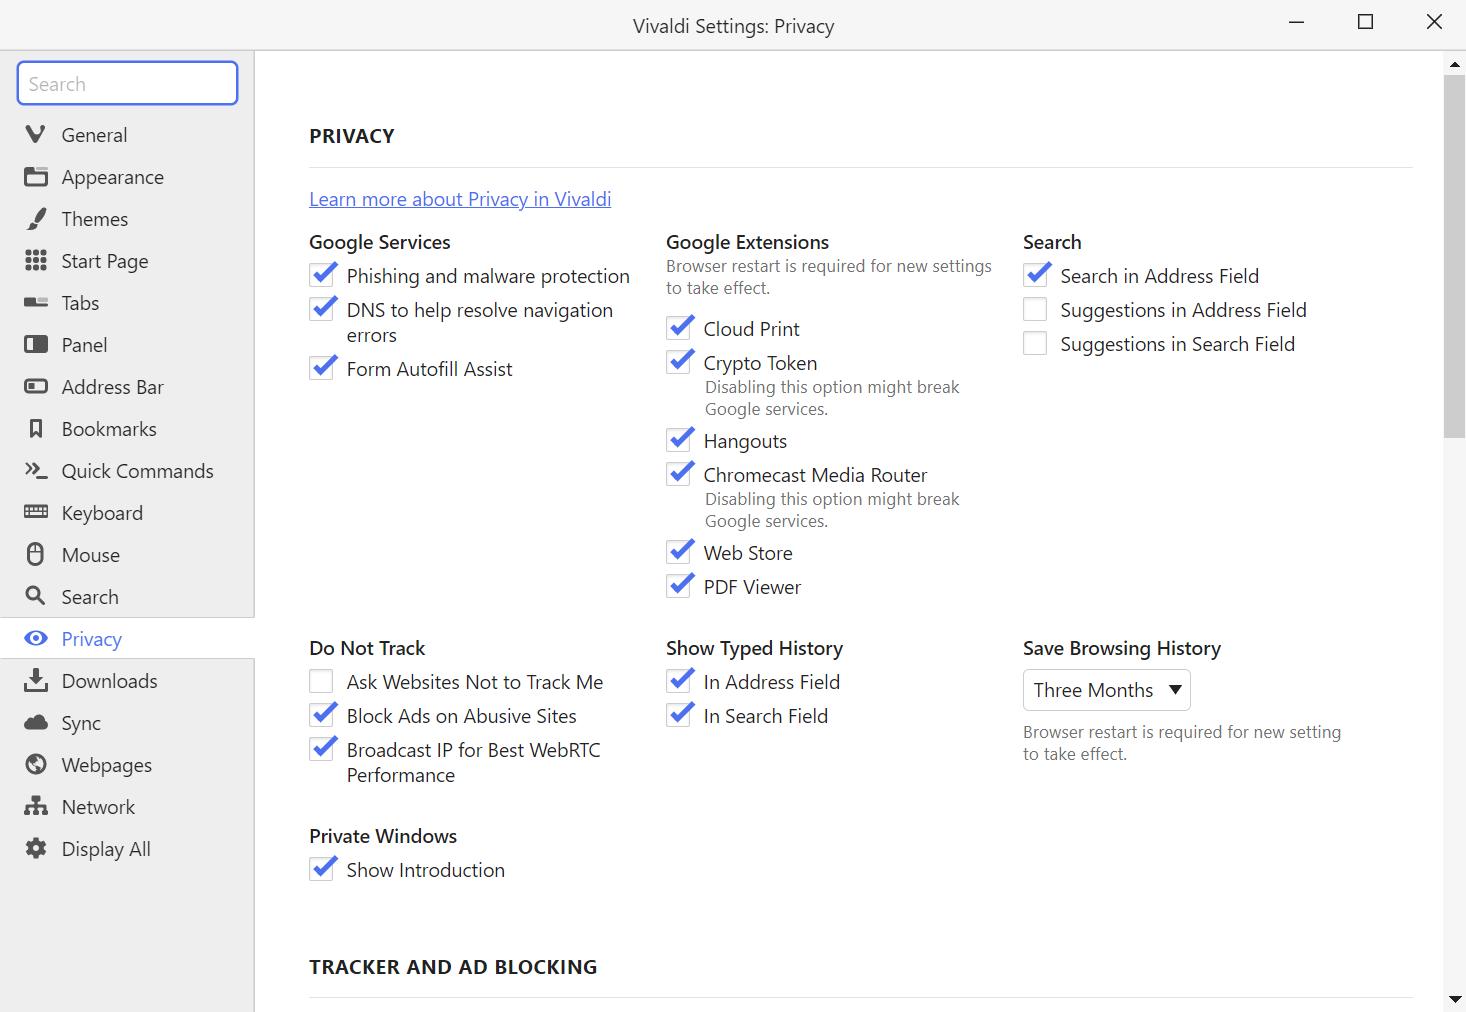 Vivaldi's Privacy settings window